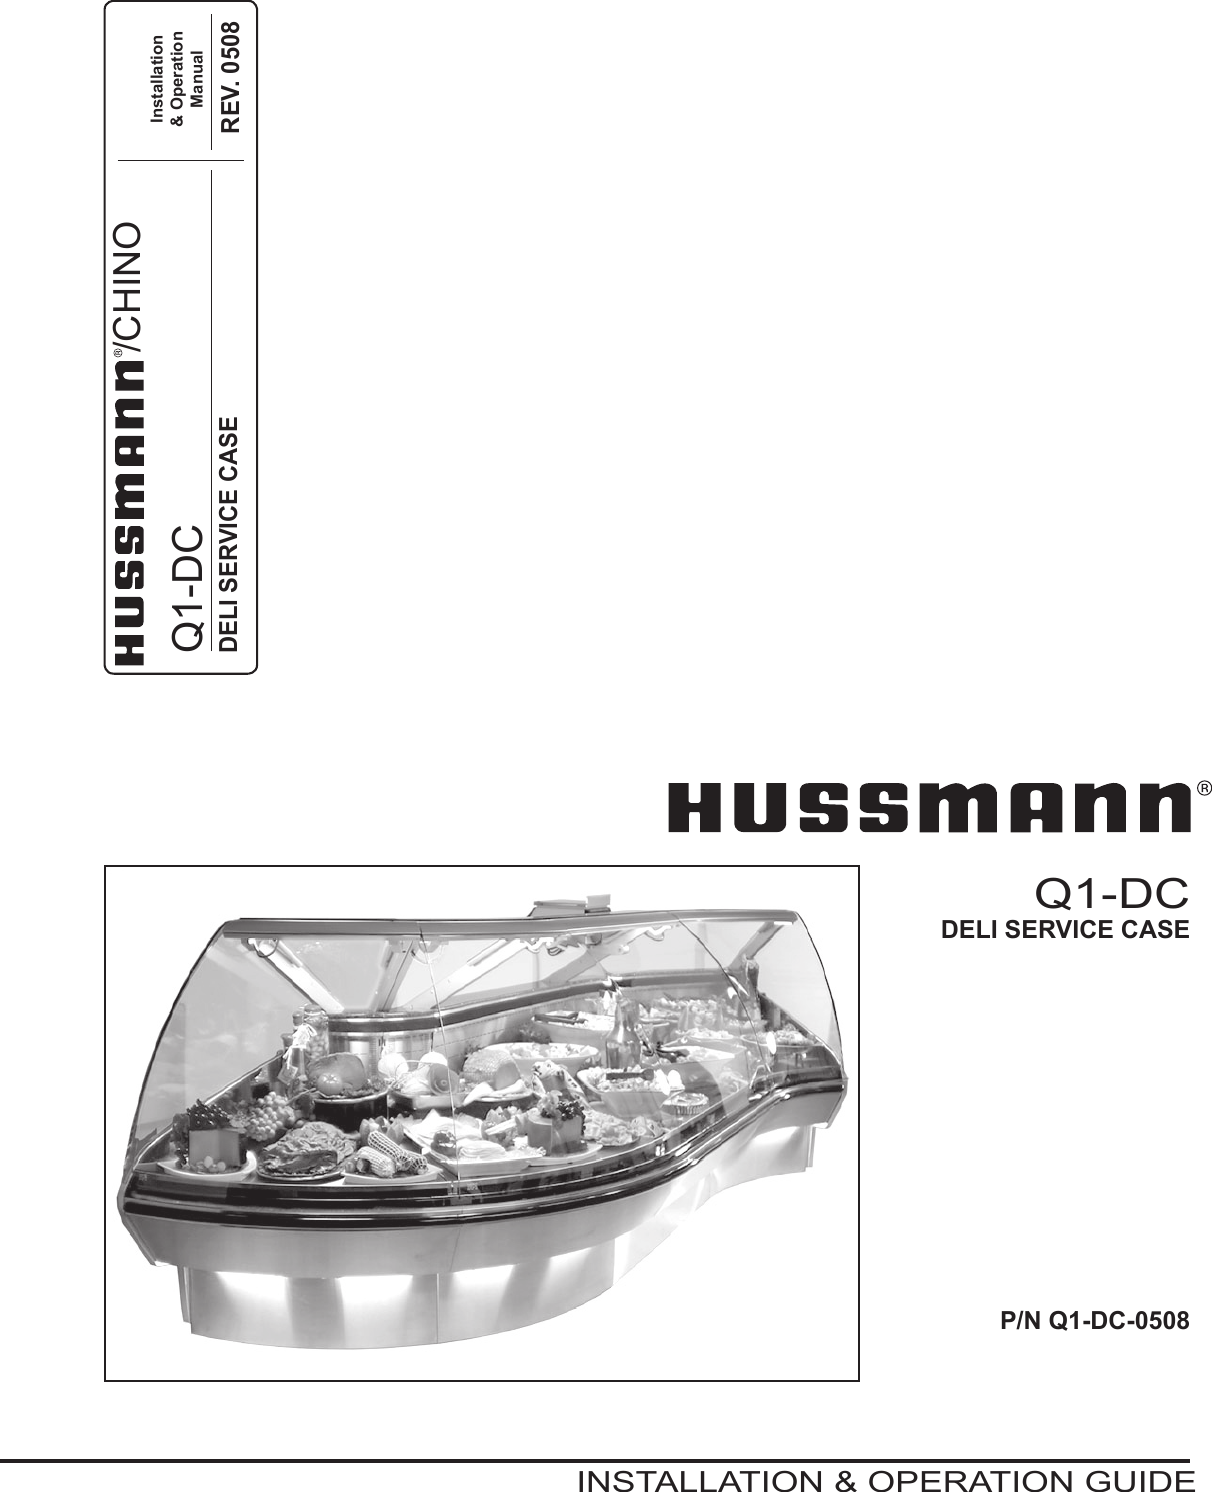 hussman coolers user guide free owners manual u2022 rh wordworksbysea com